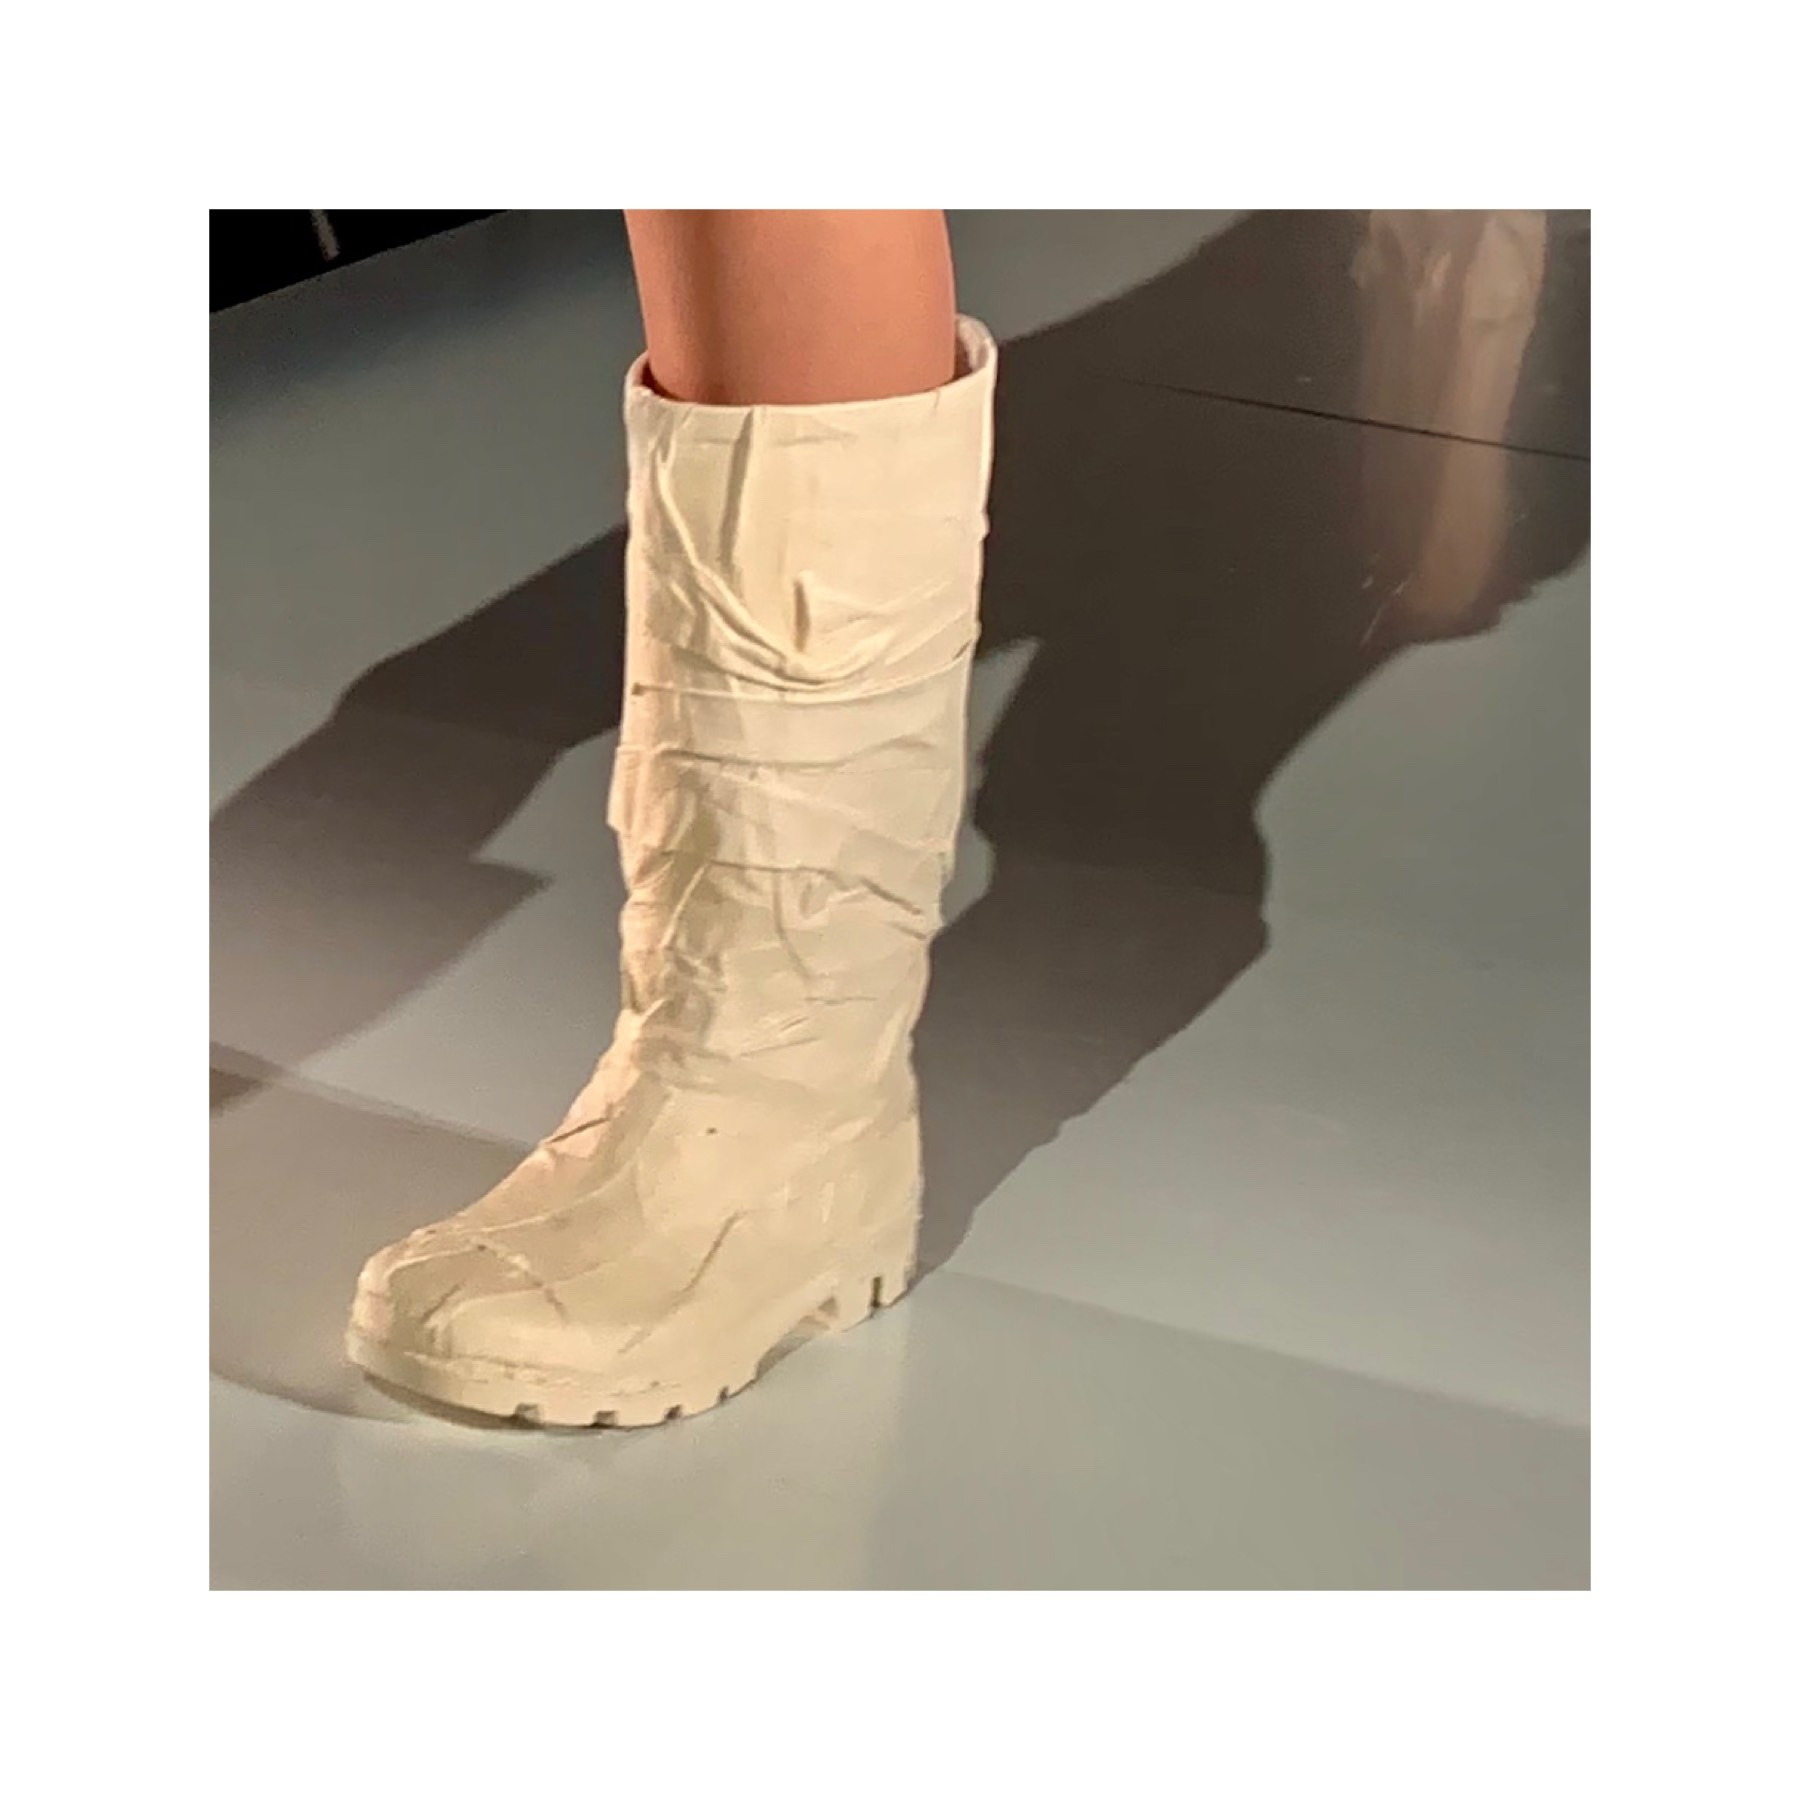 Whynotshopper-113-maison-primer-florilegi-080-bcn-fashion-botas-de-ubieta